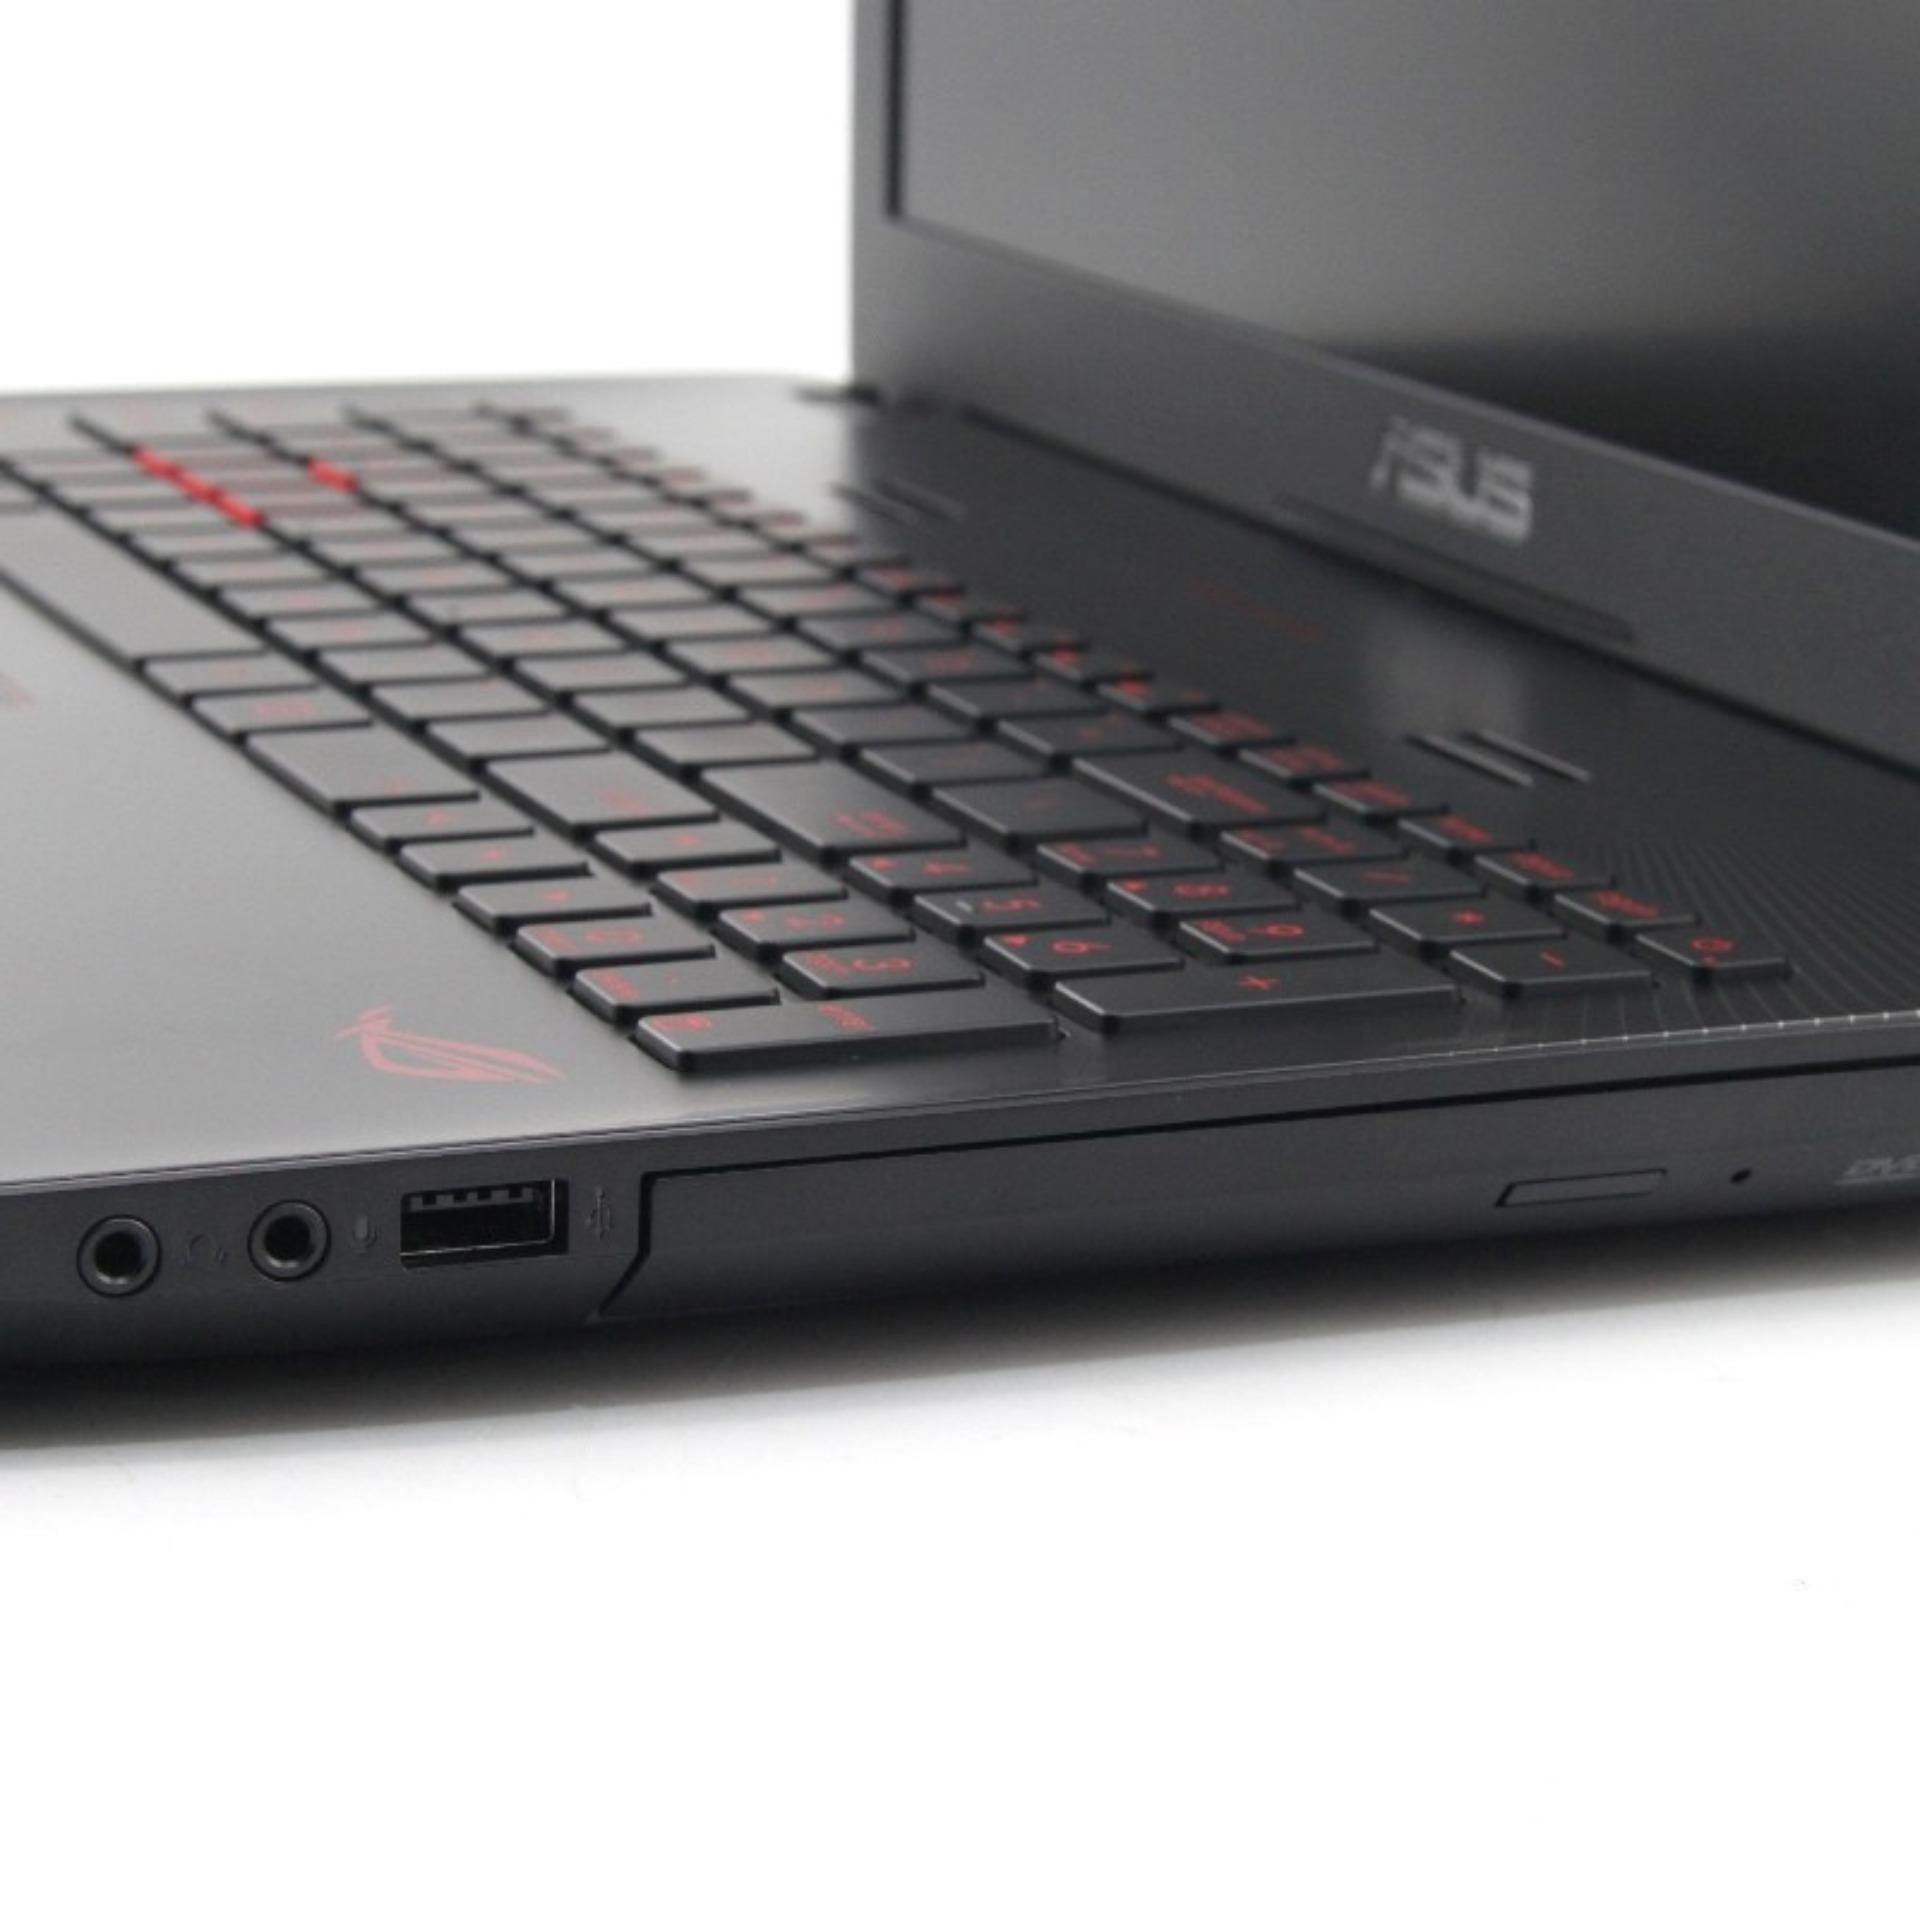 Asus A456ur Ga092d Intel Core I5 7200u 4gb 1tb Nvidia Gt930mx 2gb 14 Wx039d Notebook Red Inch 6200u 4 Gb 1 Tb Dos Rog Gl552vx Dm409t Ram I7